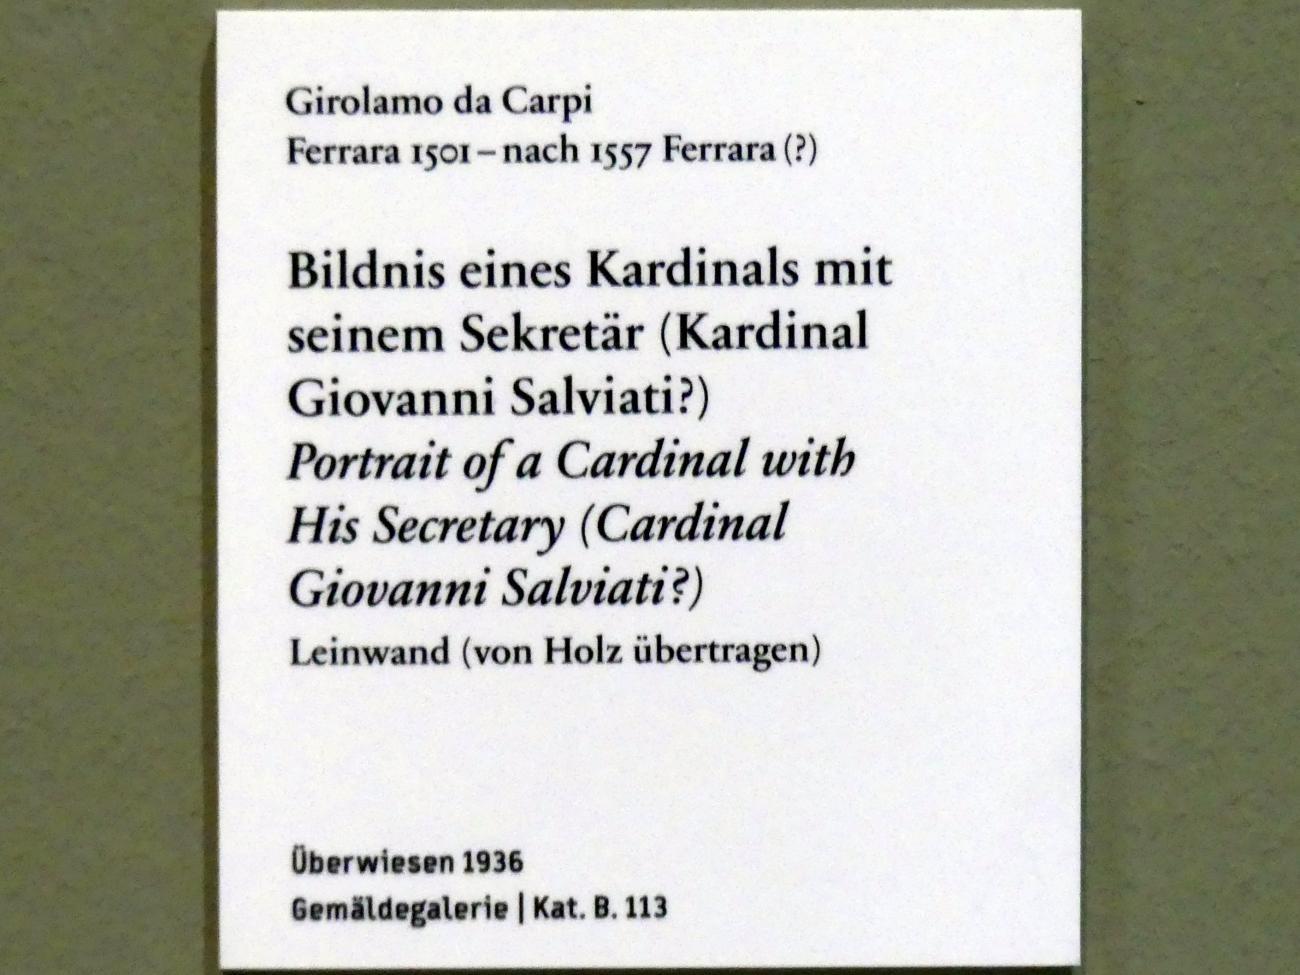 Girolamo da Carpi: Bildnis eines Kardinals mit einem Sekretär (Kardinal Giovanni Salviati ?), Undatiert, Bild 2/2